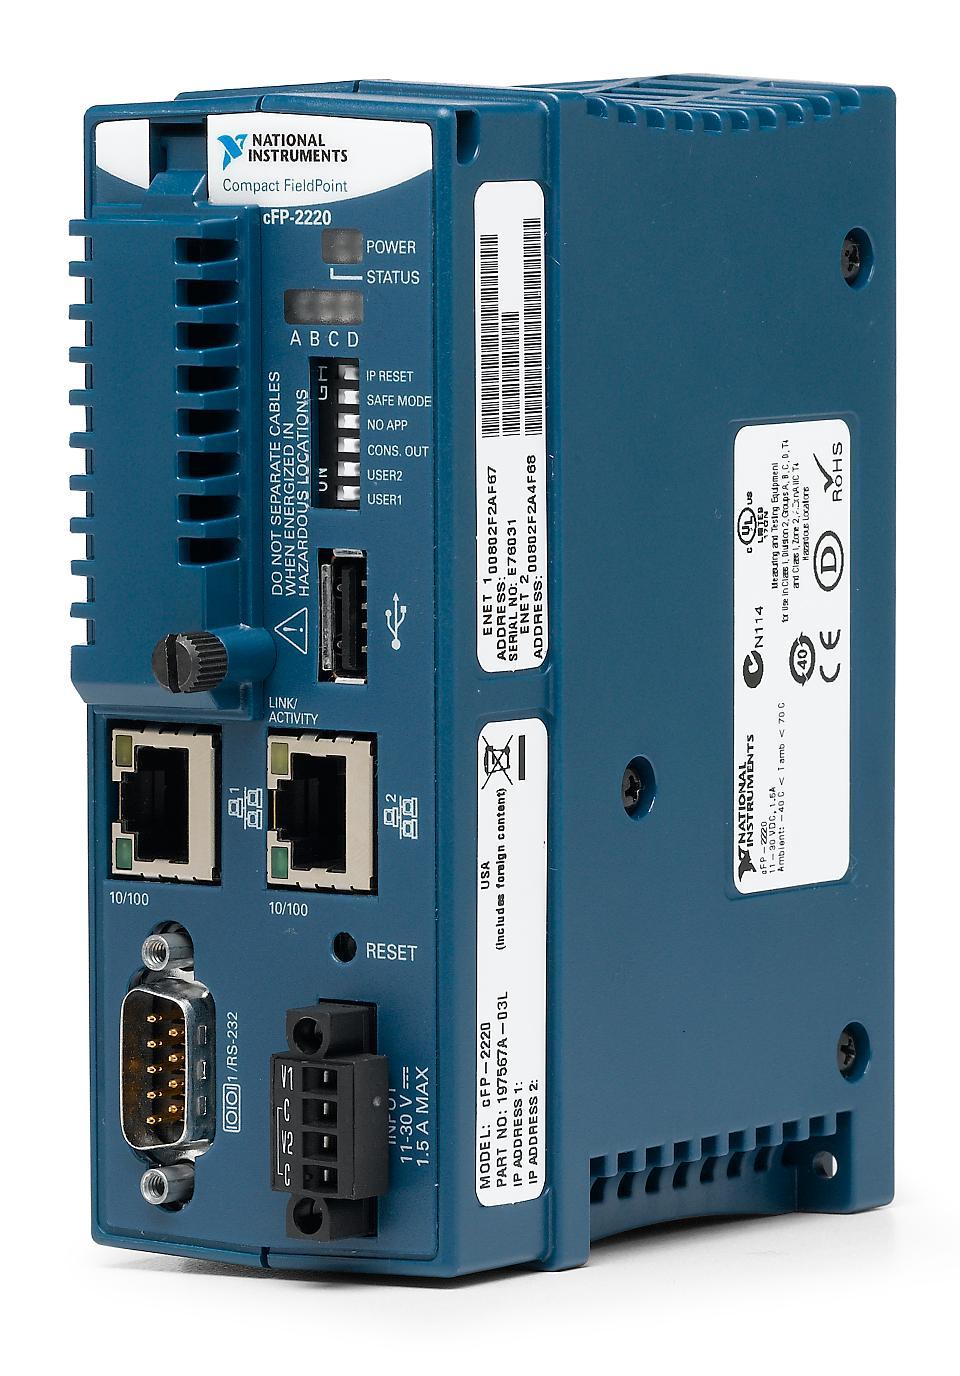 cFP-2220